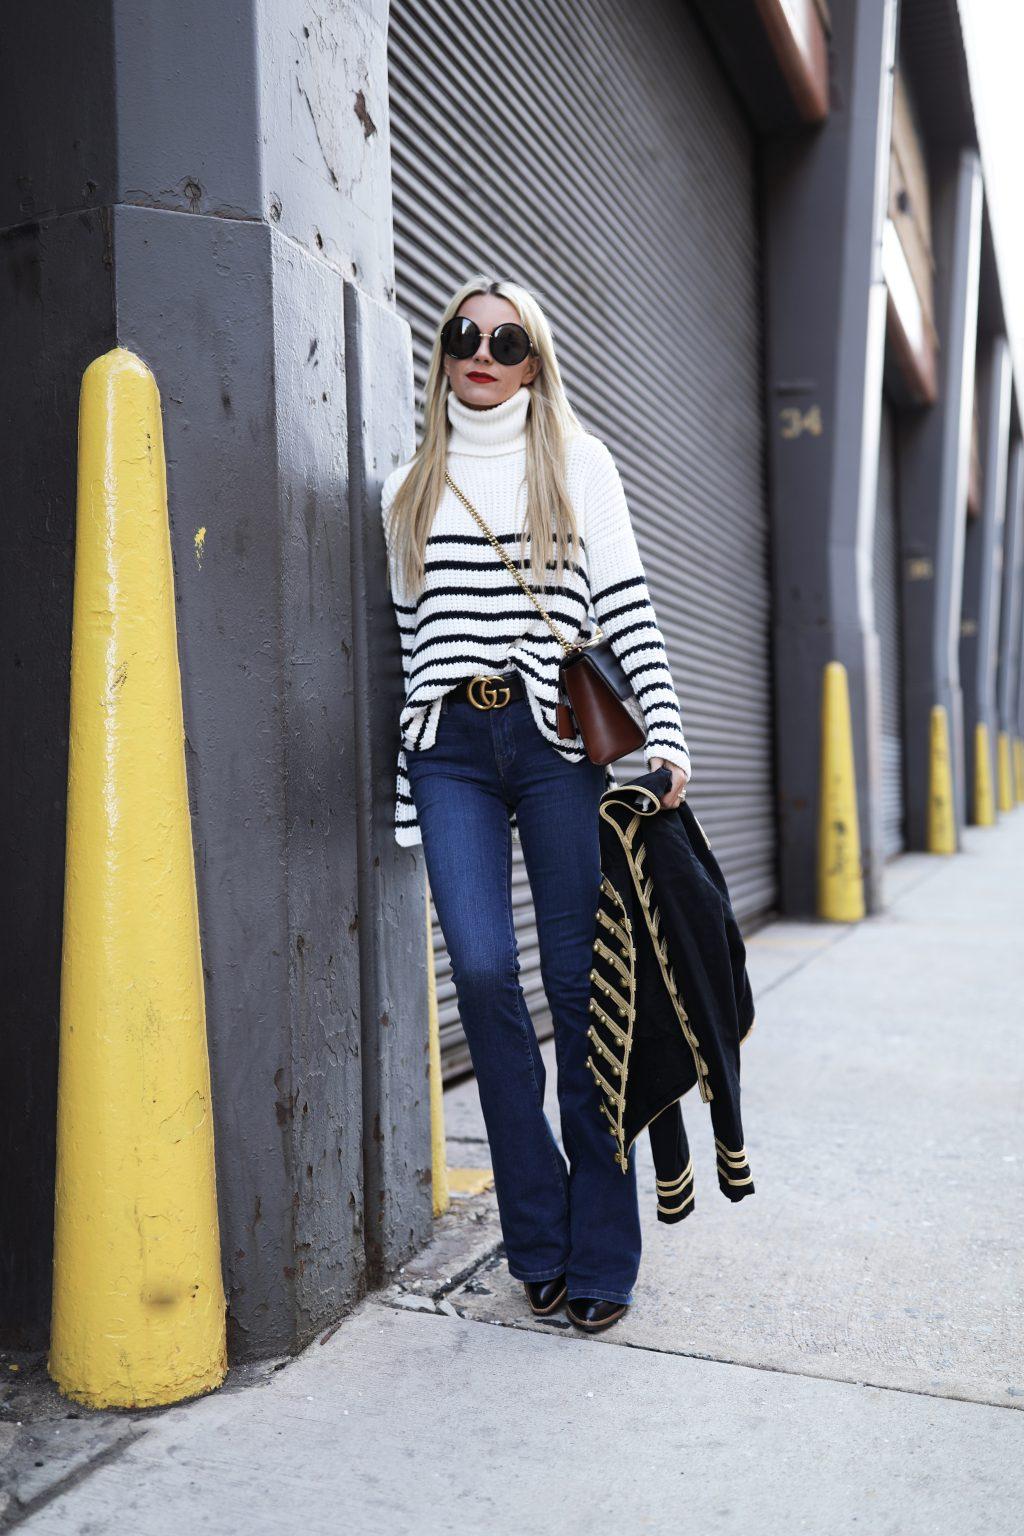 atlantic-pacific-nyc-blog-street-style-stripe-stripes-band-jacket-gucci-bag-denim-jeans